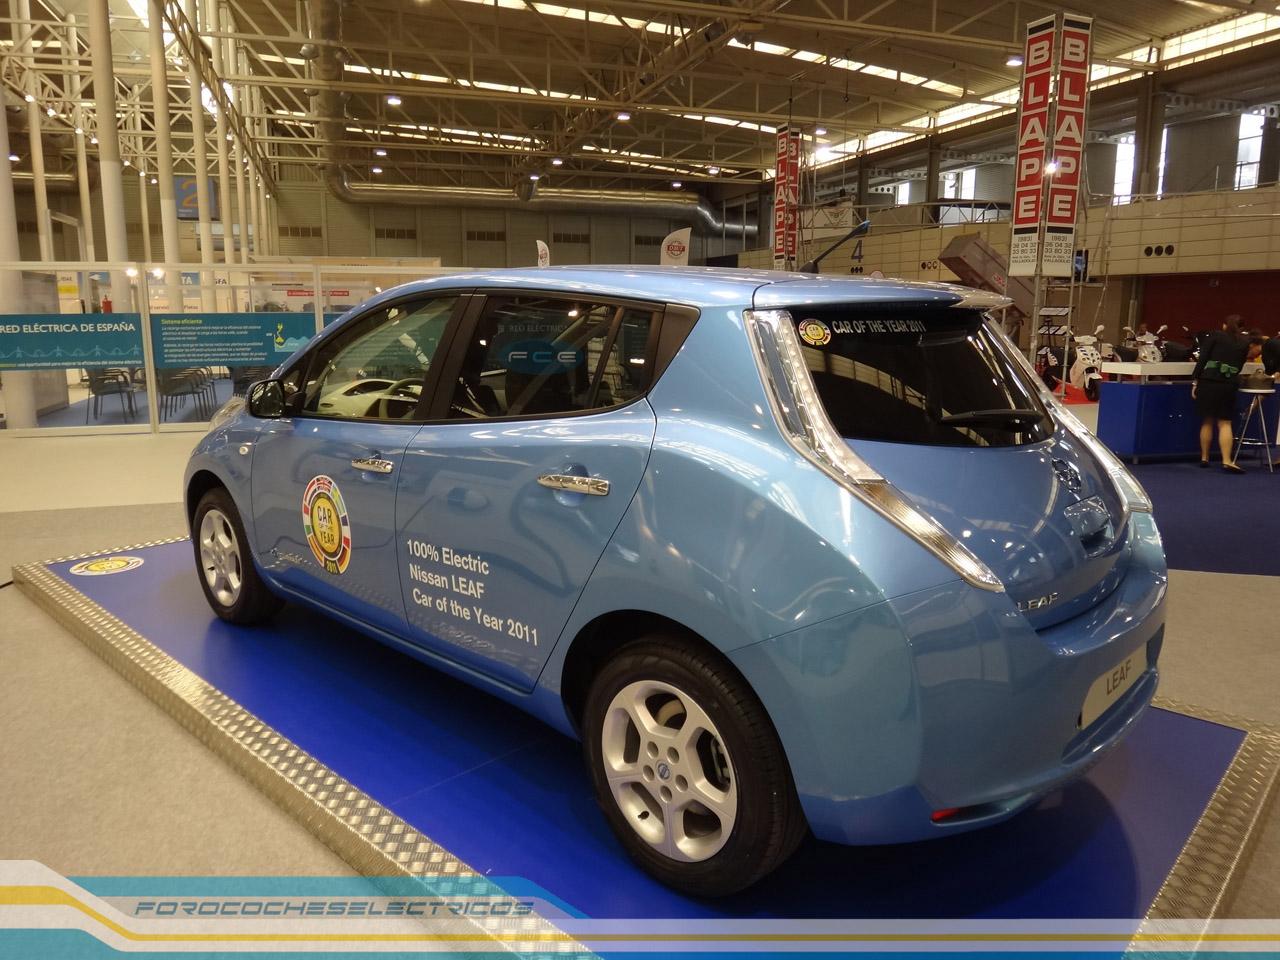 DetallesForococheselectricos Nissan LeafTodos Los LeafTodos Nissan Los DetallesForococheselectricos FTJlKu1c3